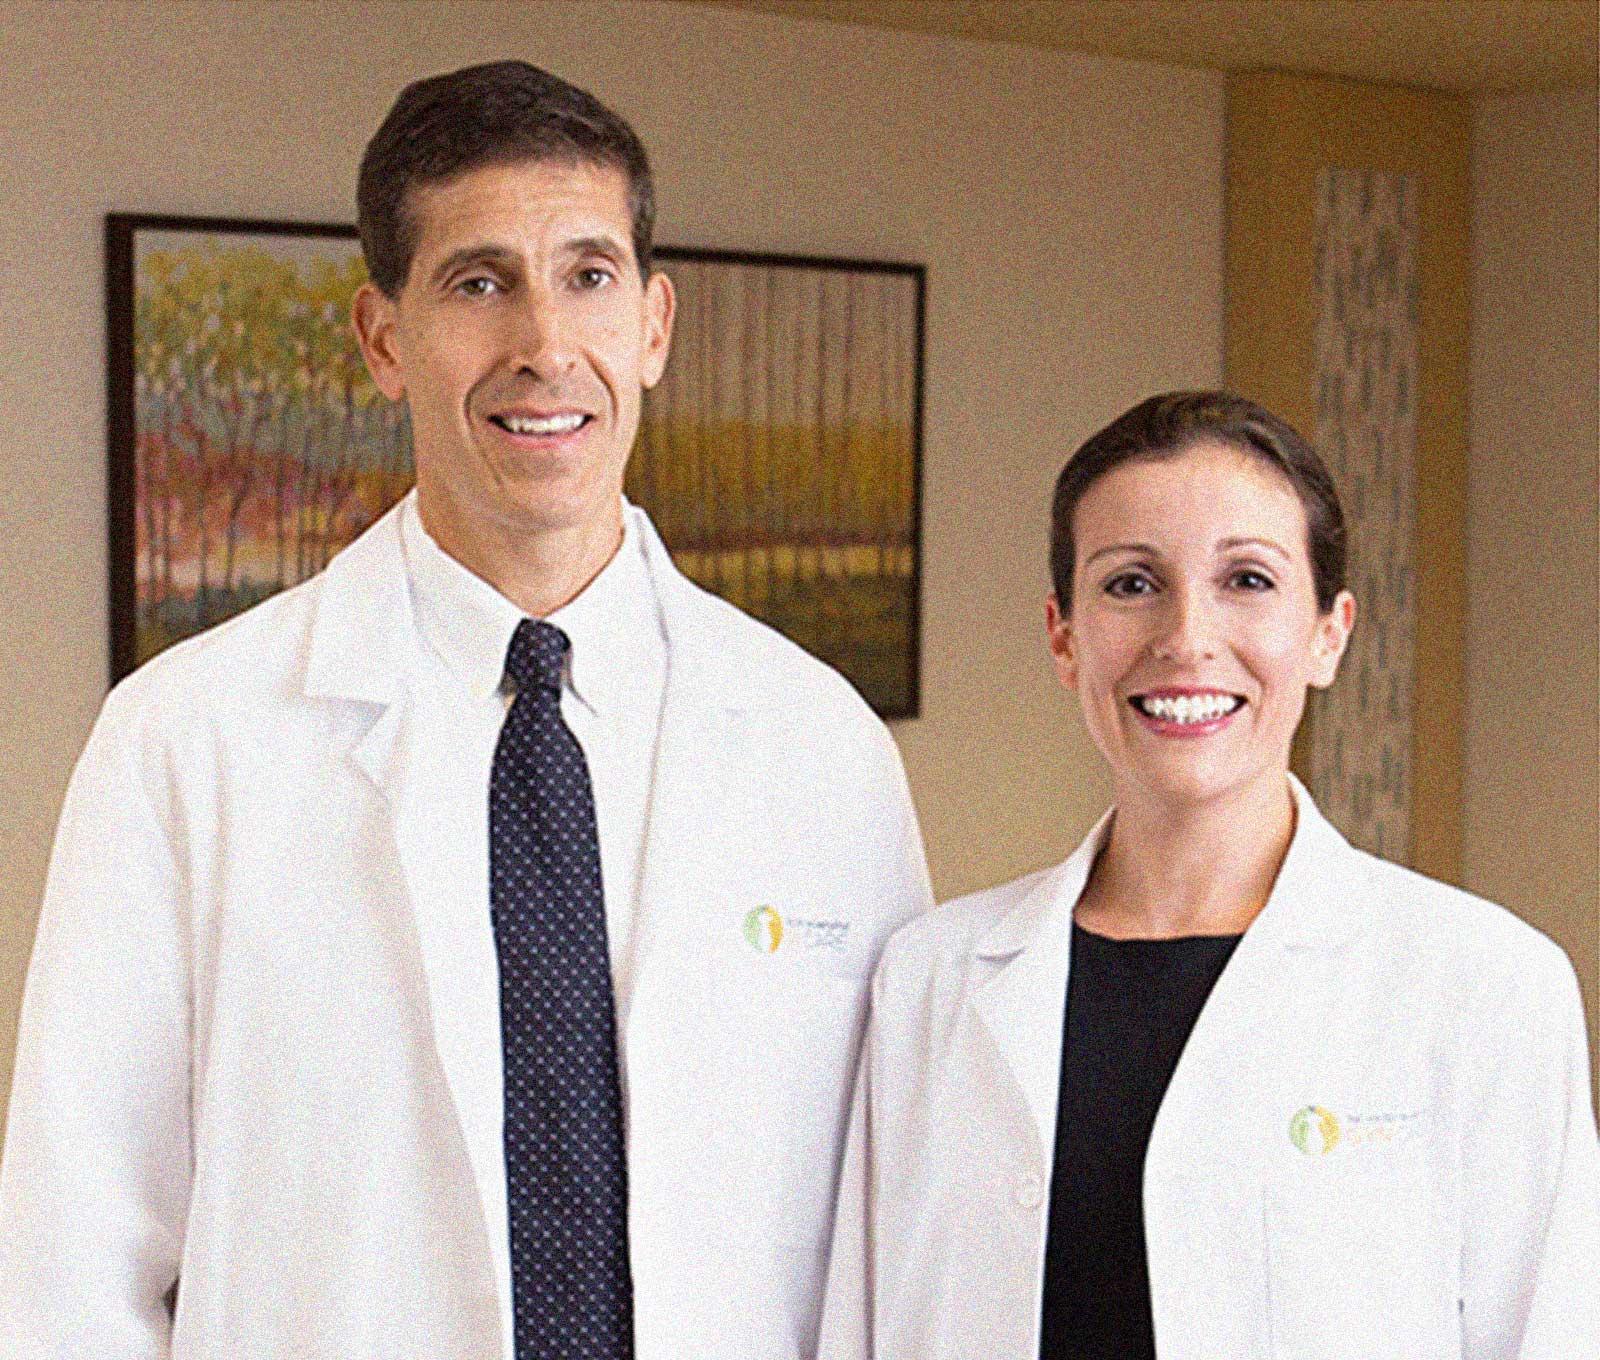 CIGC doctors